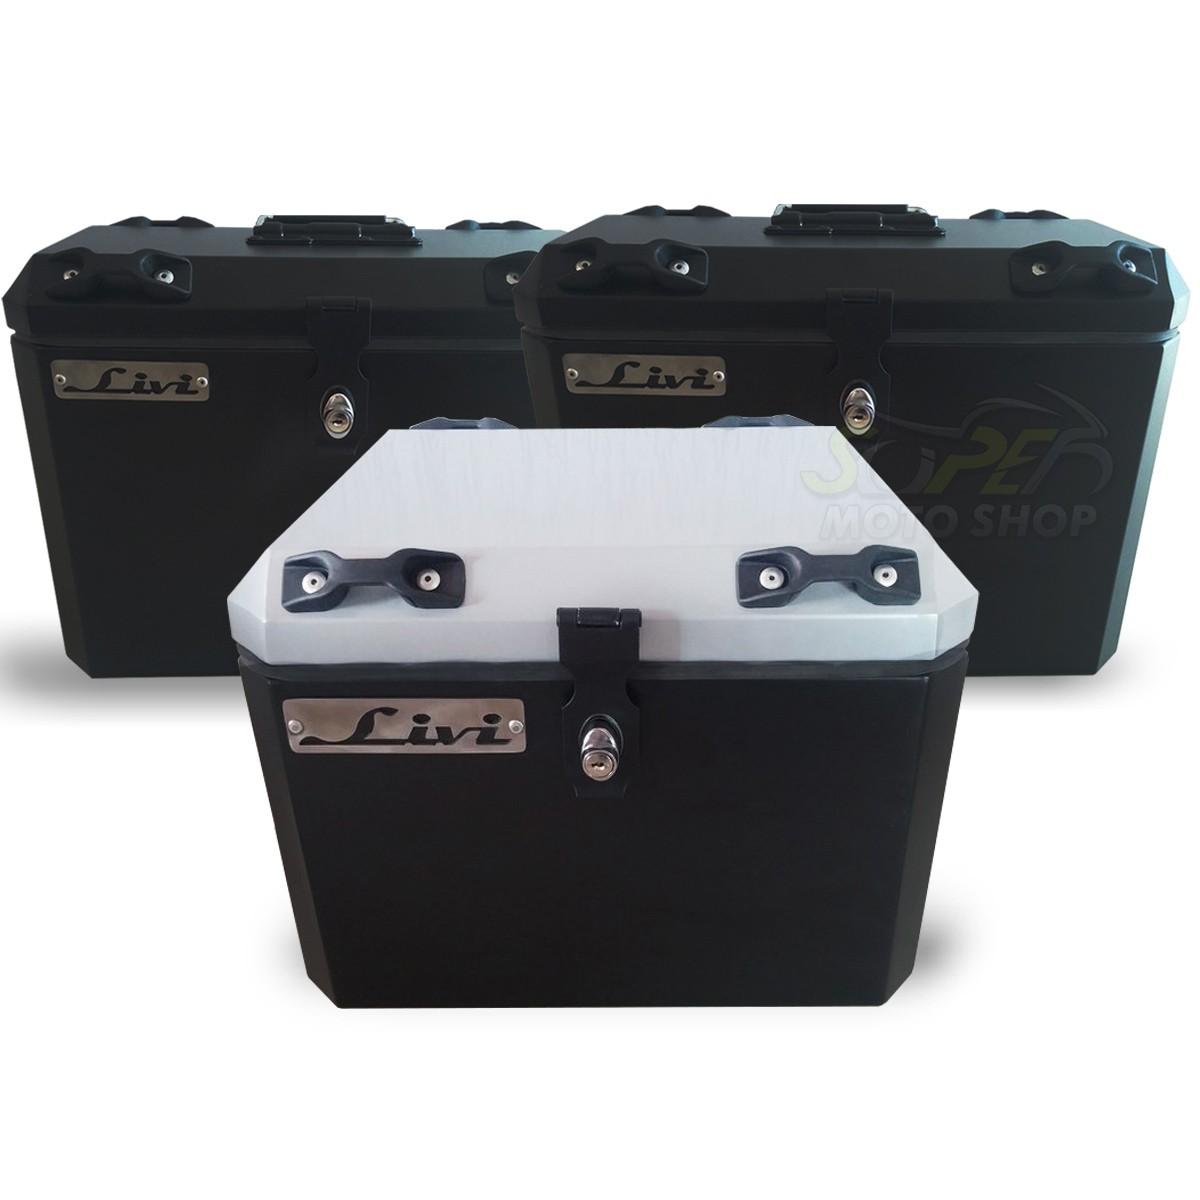 Kit Baú / Bauleto Alumínio Traseiro Top Case + Lateral Side Case + Suporte Para Baú de Alumínio Livi - Transalp 700 - Honda